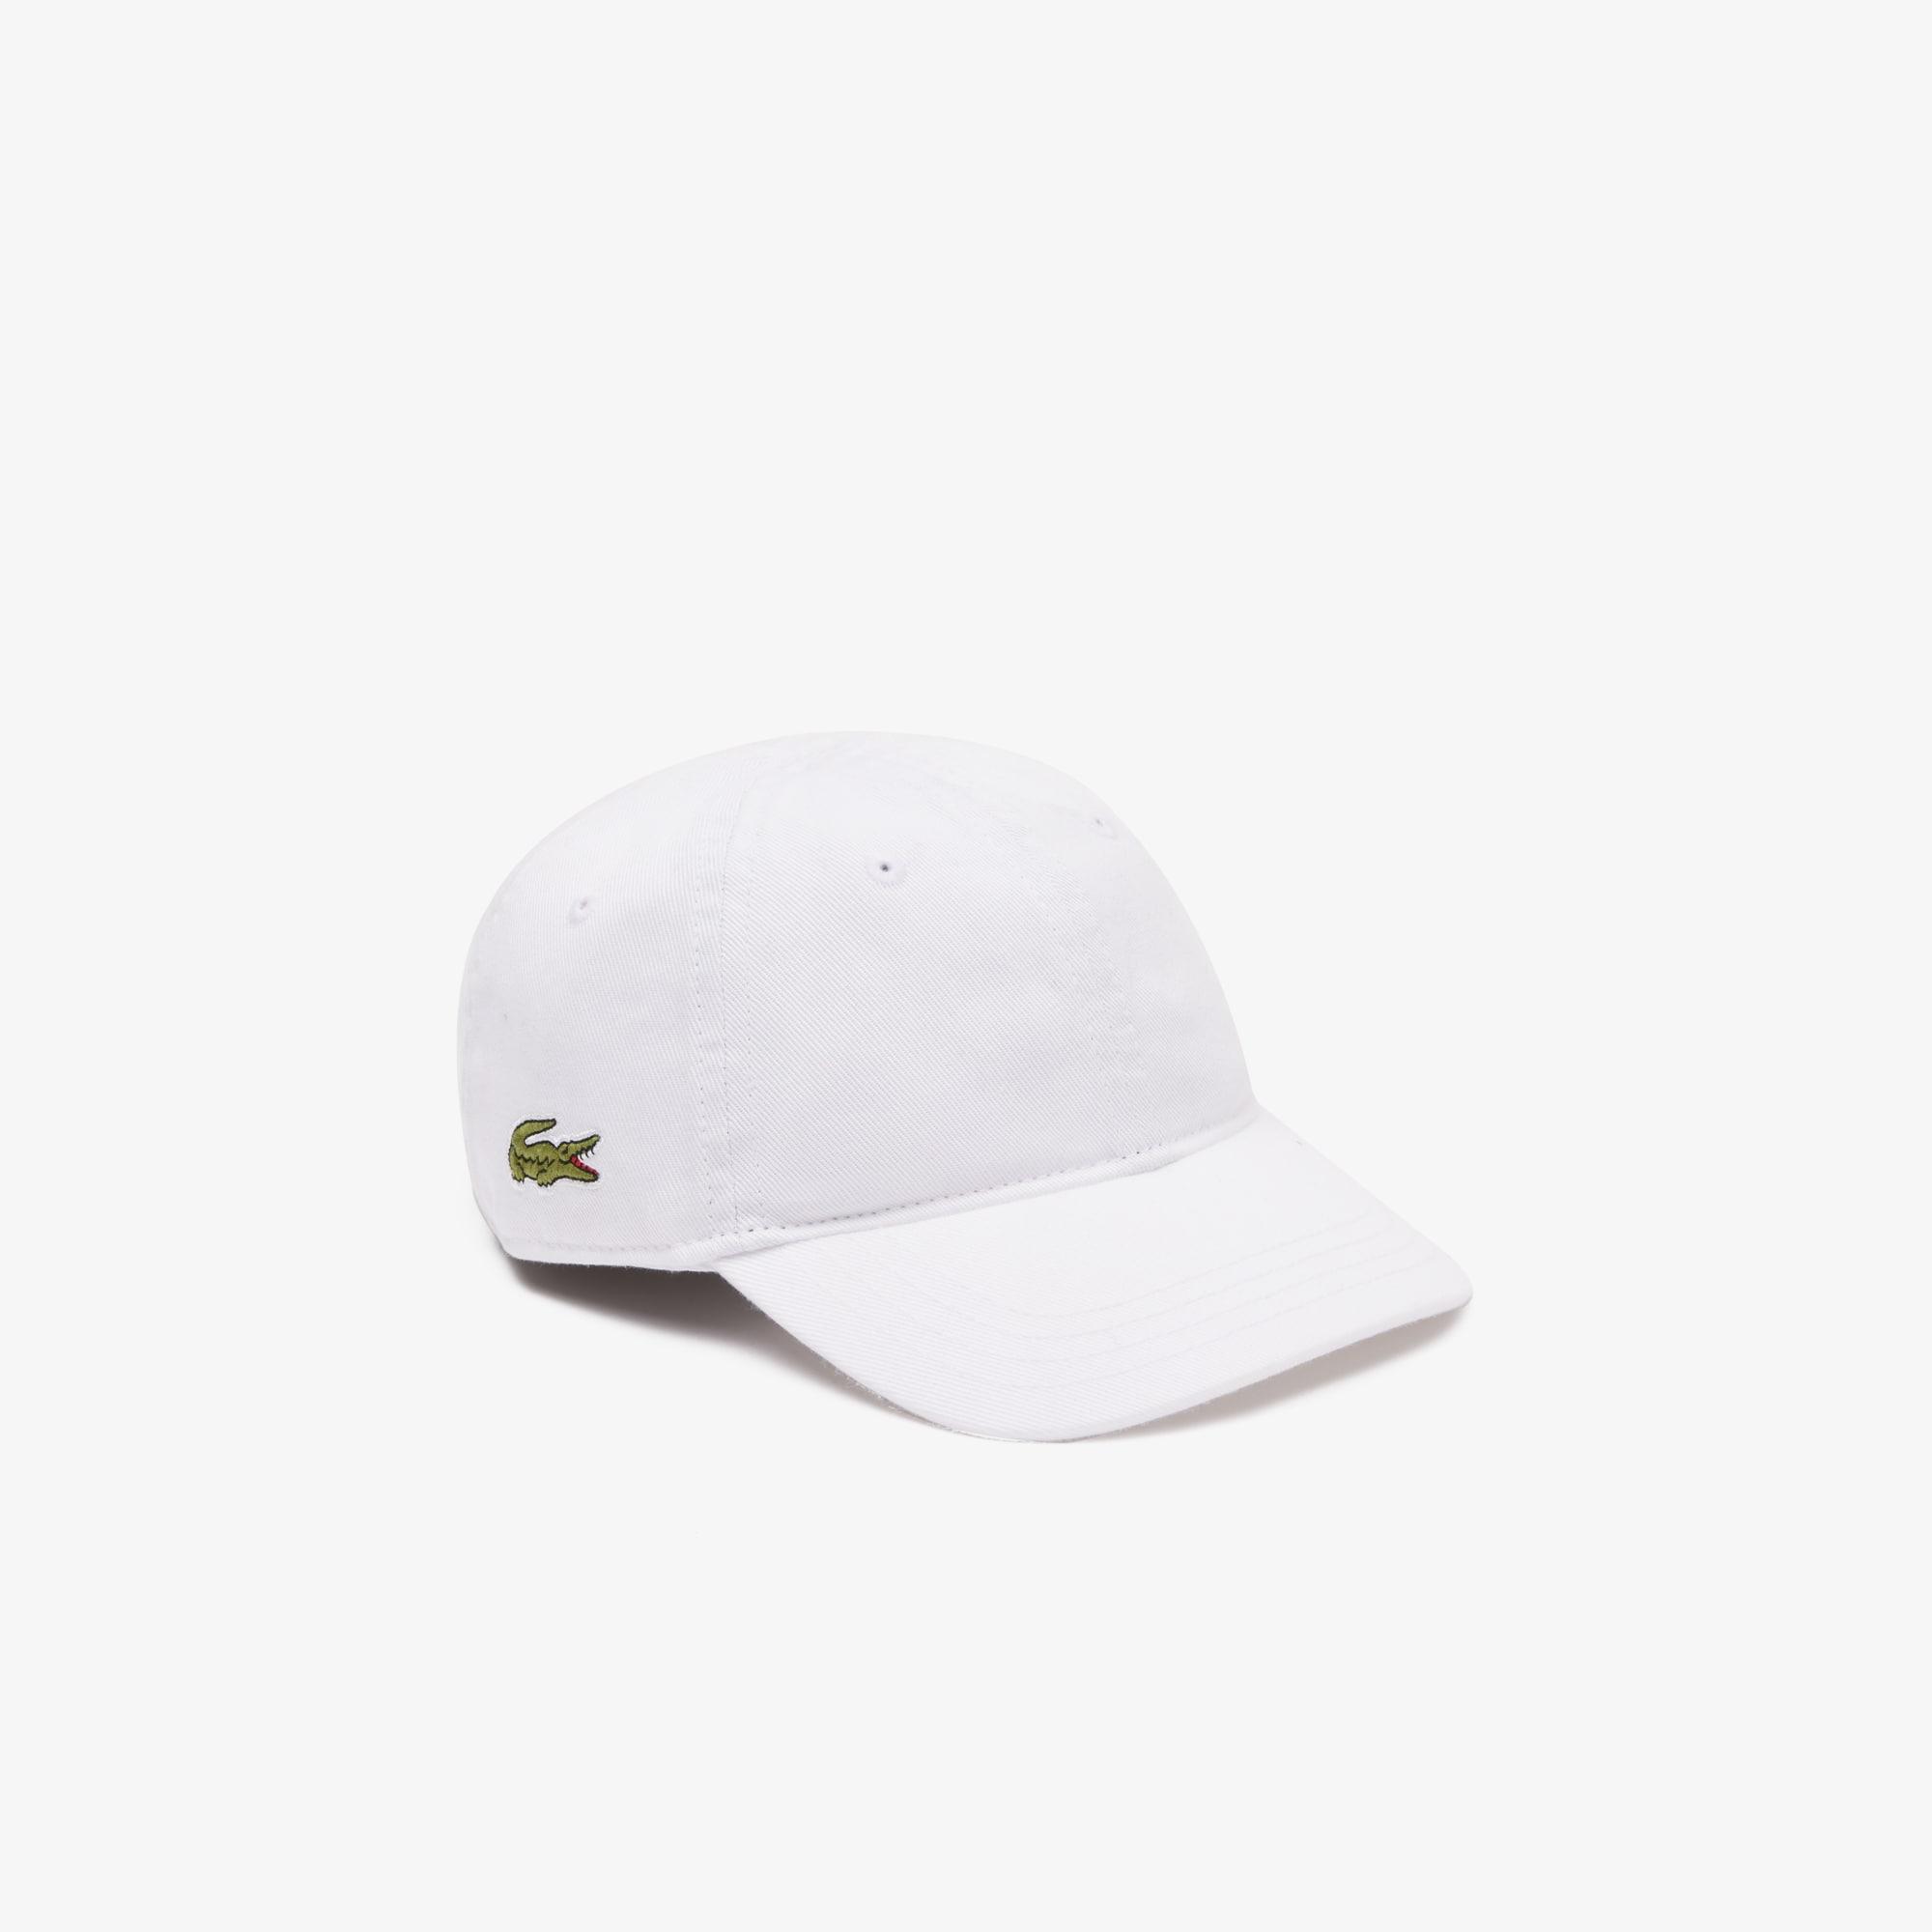 Lacoste Lingerie Boys' Solid Gabardine Cap